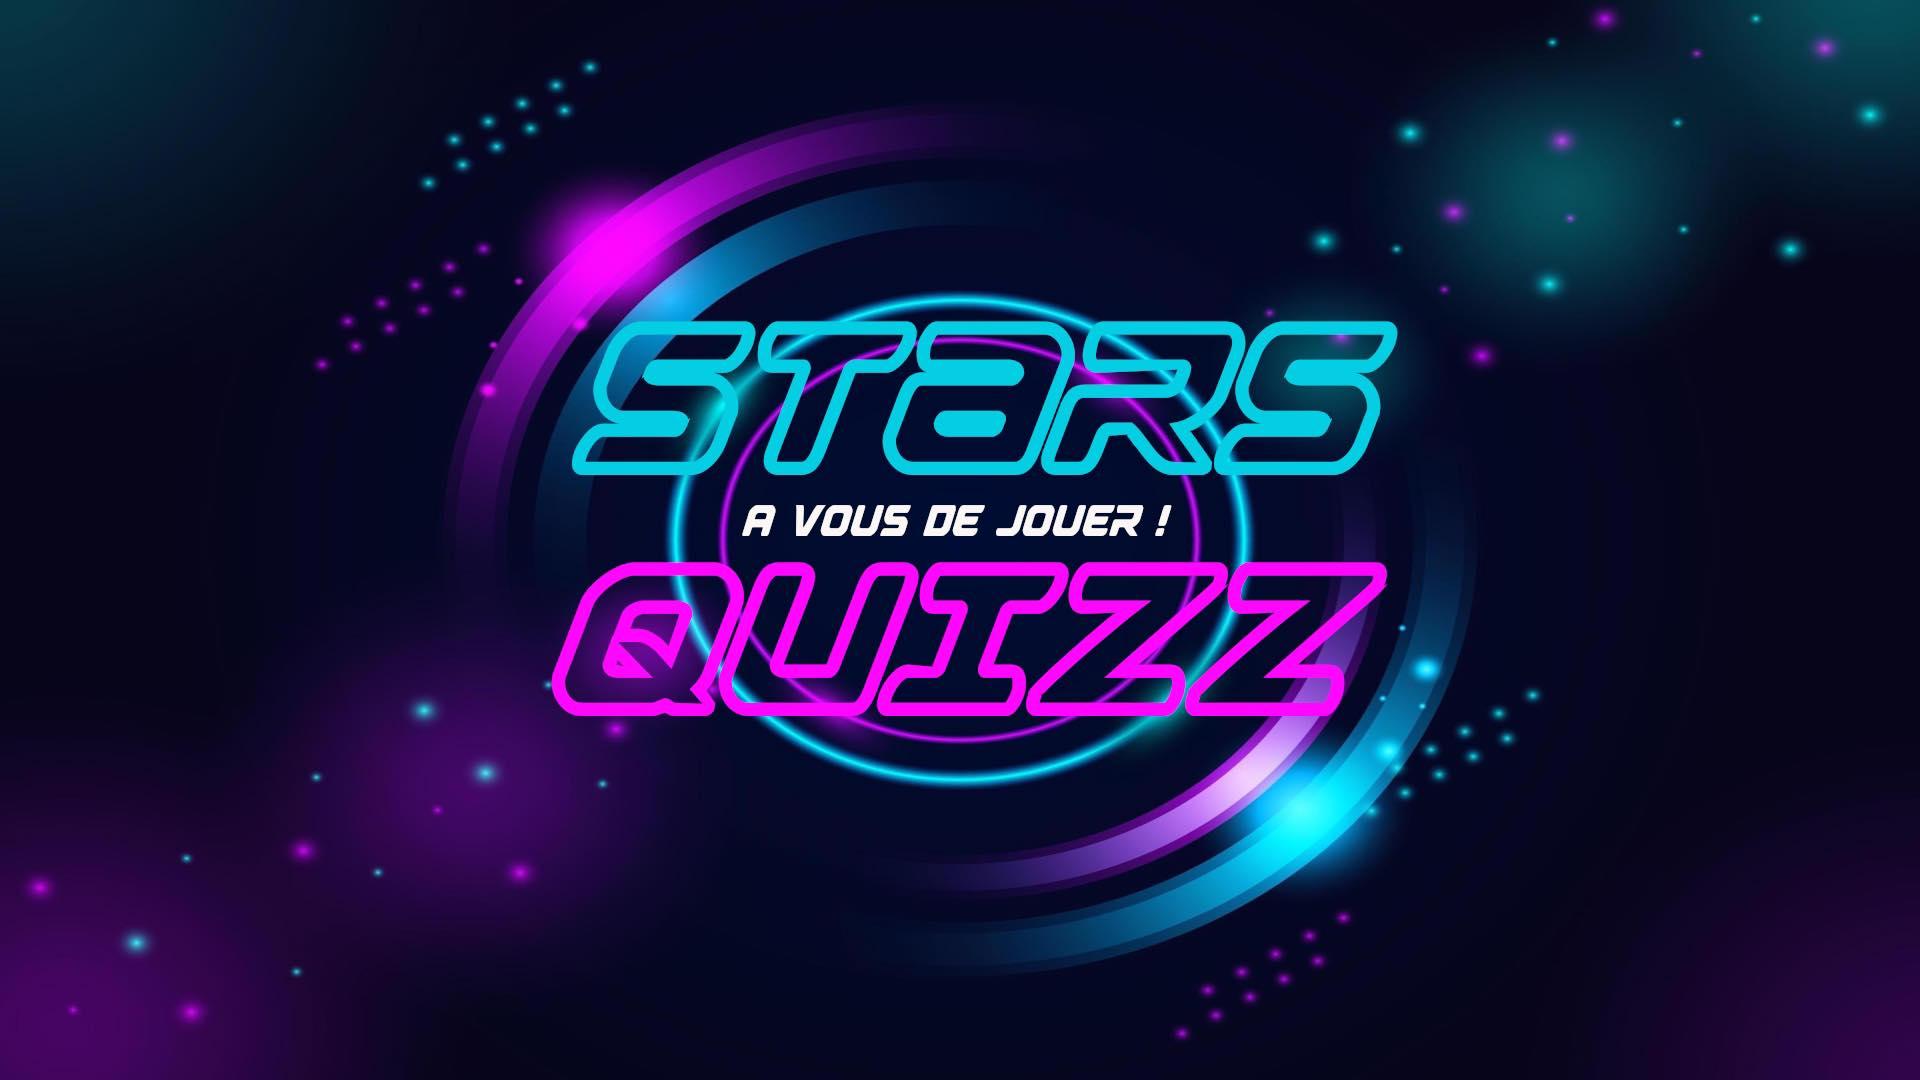 STARS QUIZZ - le lagon bleu animations.jpg